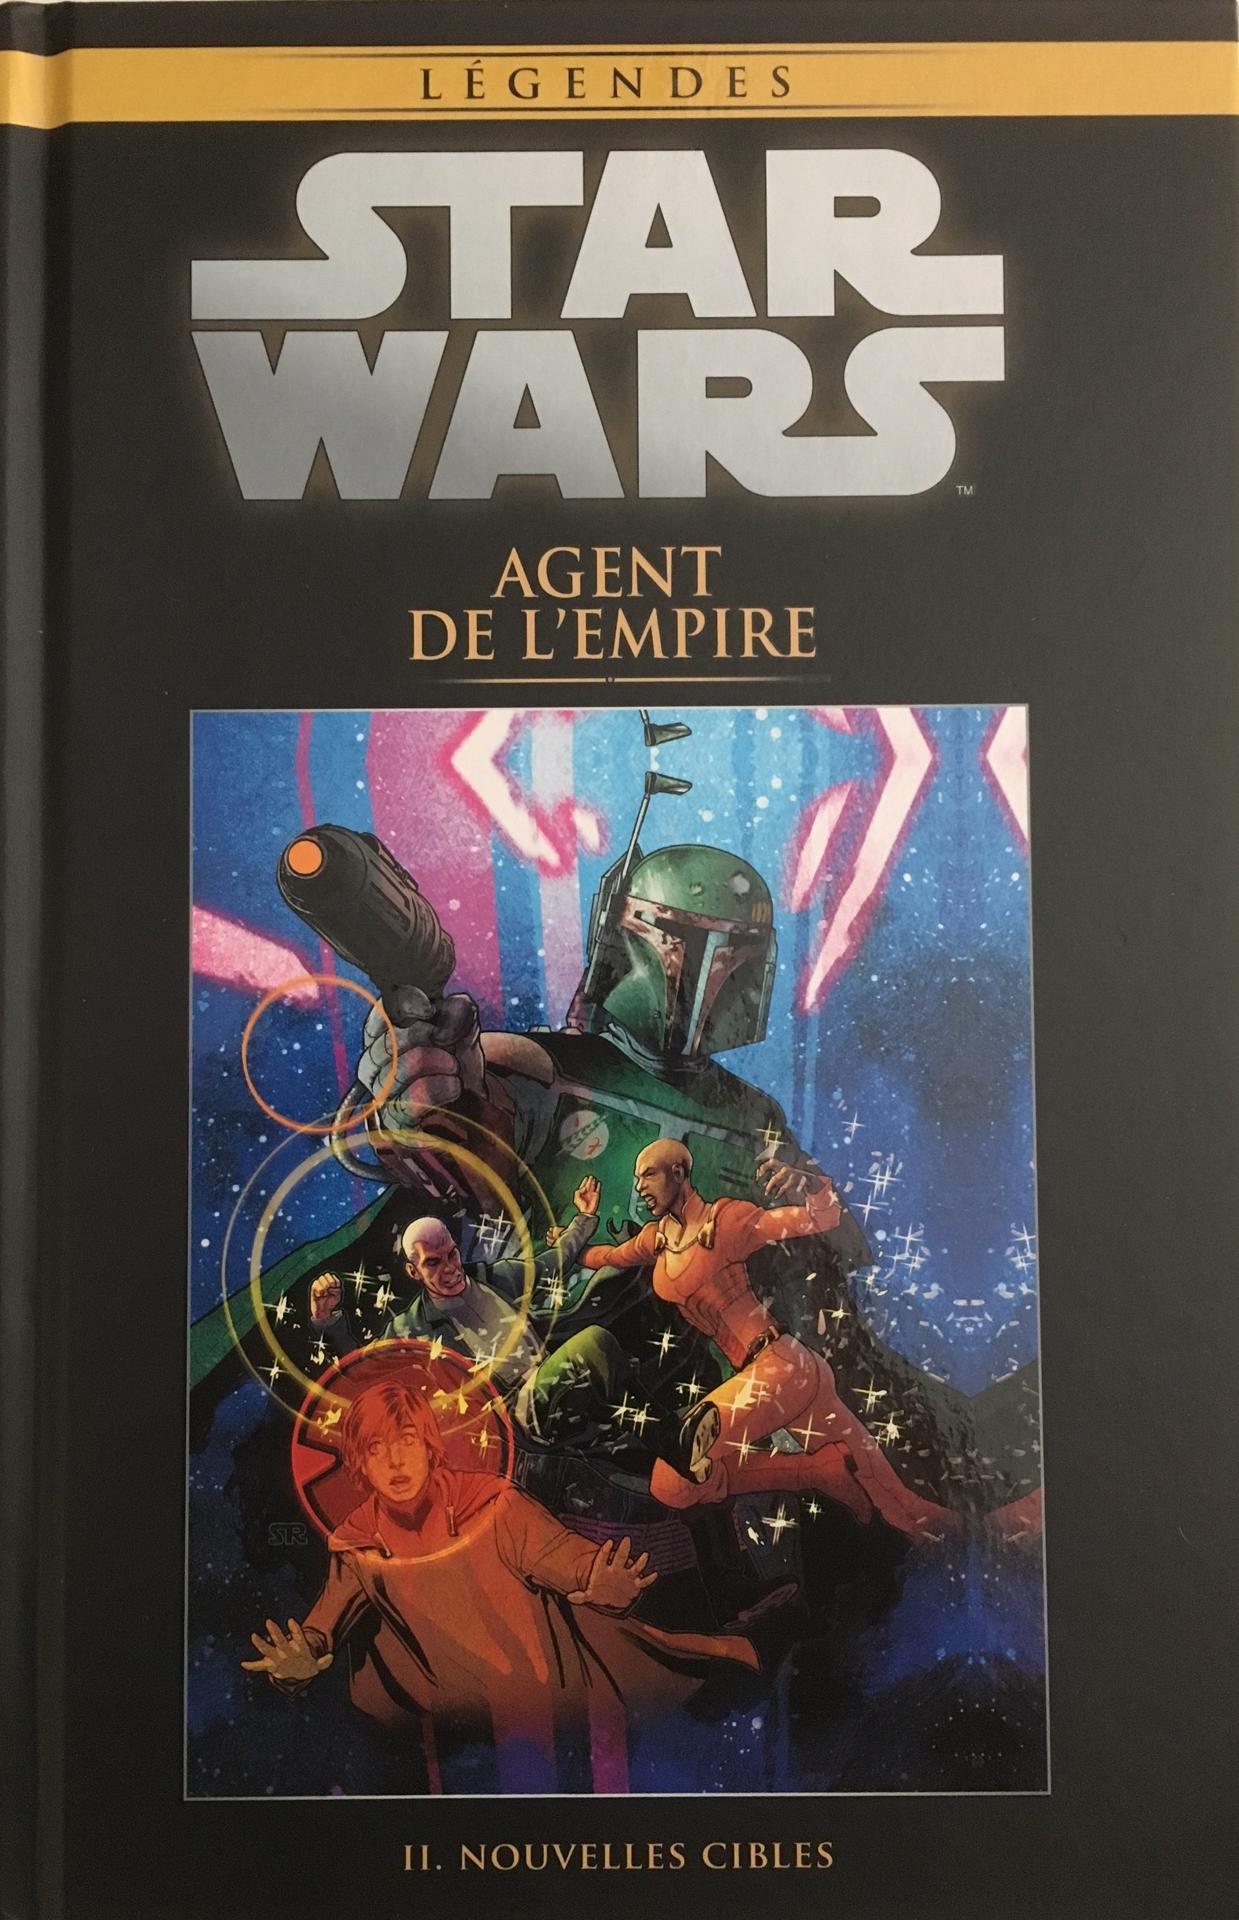 Star Wars Légendes T44 : Agent de l'Empire - Nouvelles cibles (0), comics chez Hachette de Ostrander, Fabbri, Dzioba, Roux